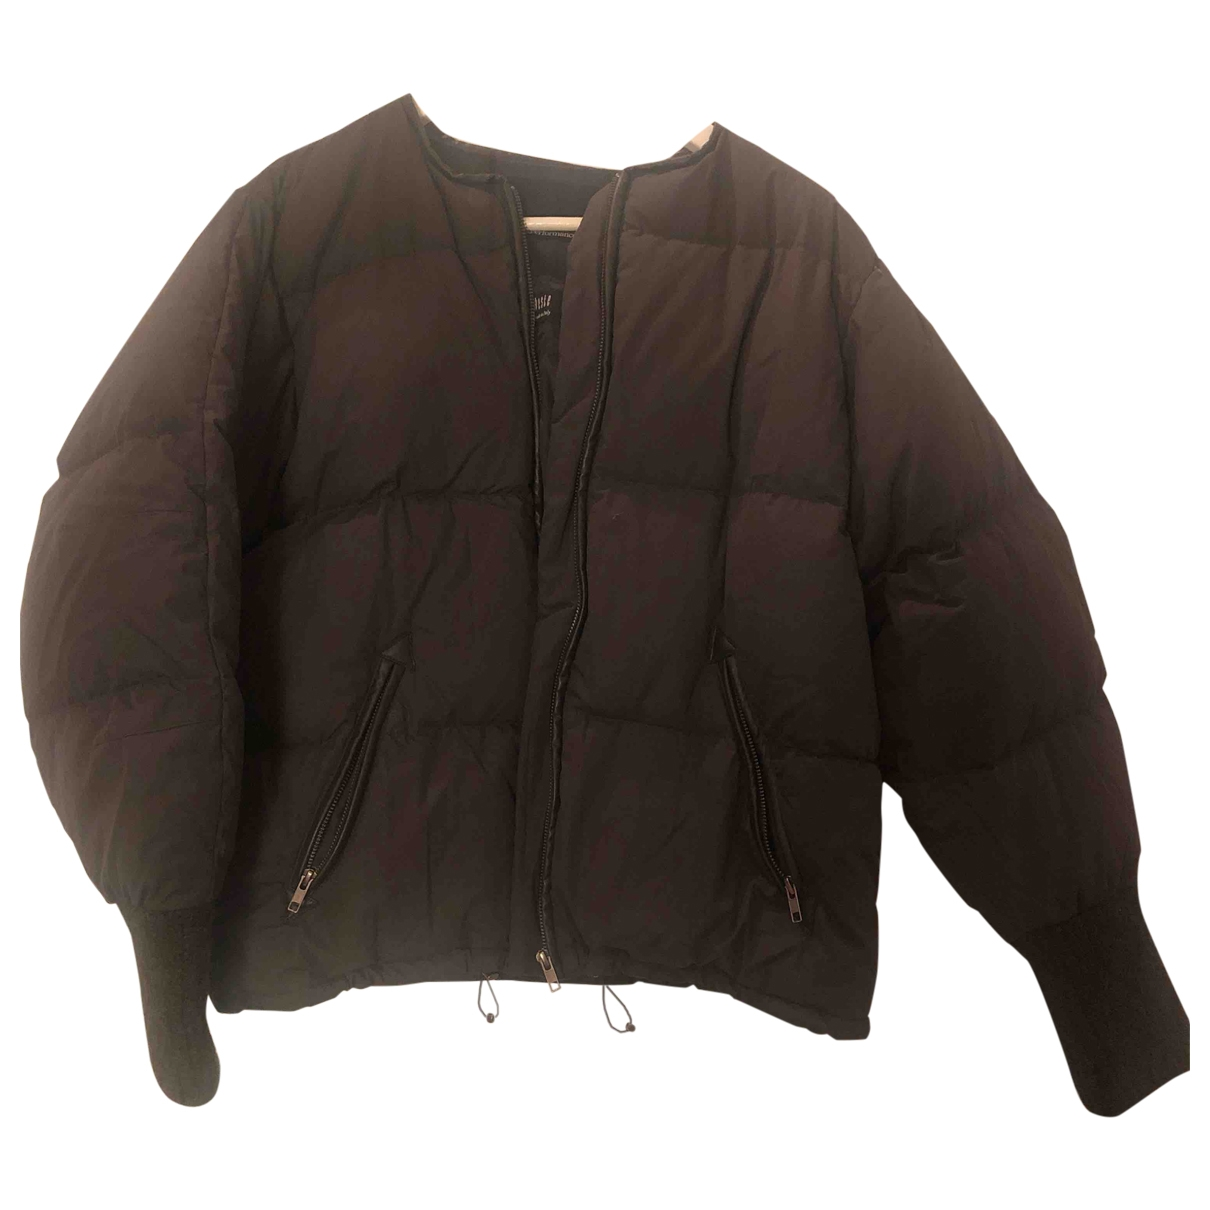 Peak Performance \N Green Cotton jacket for Women M International